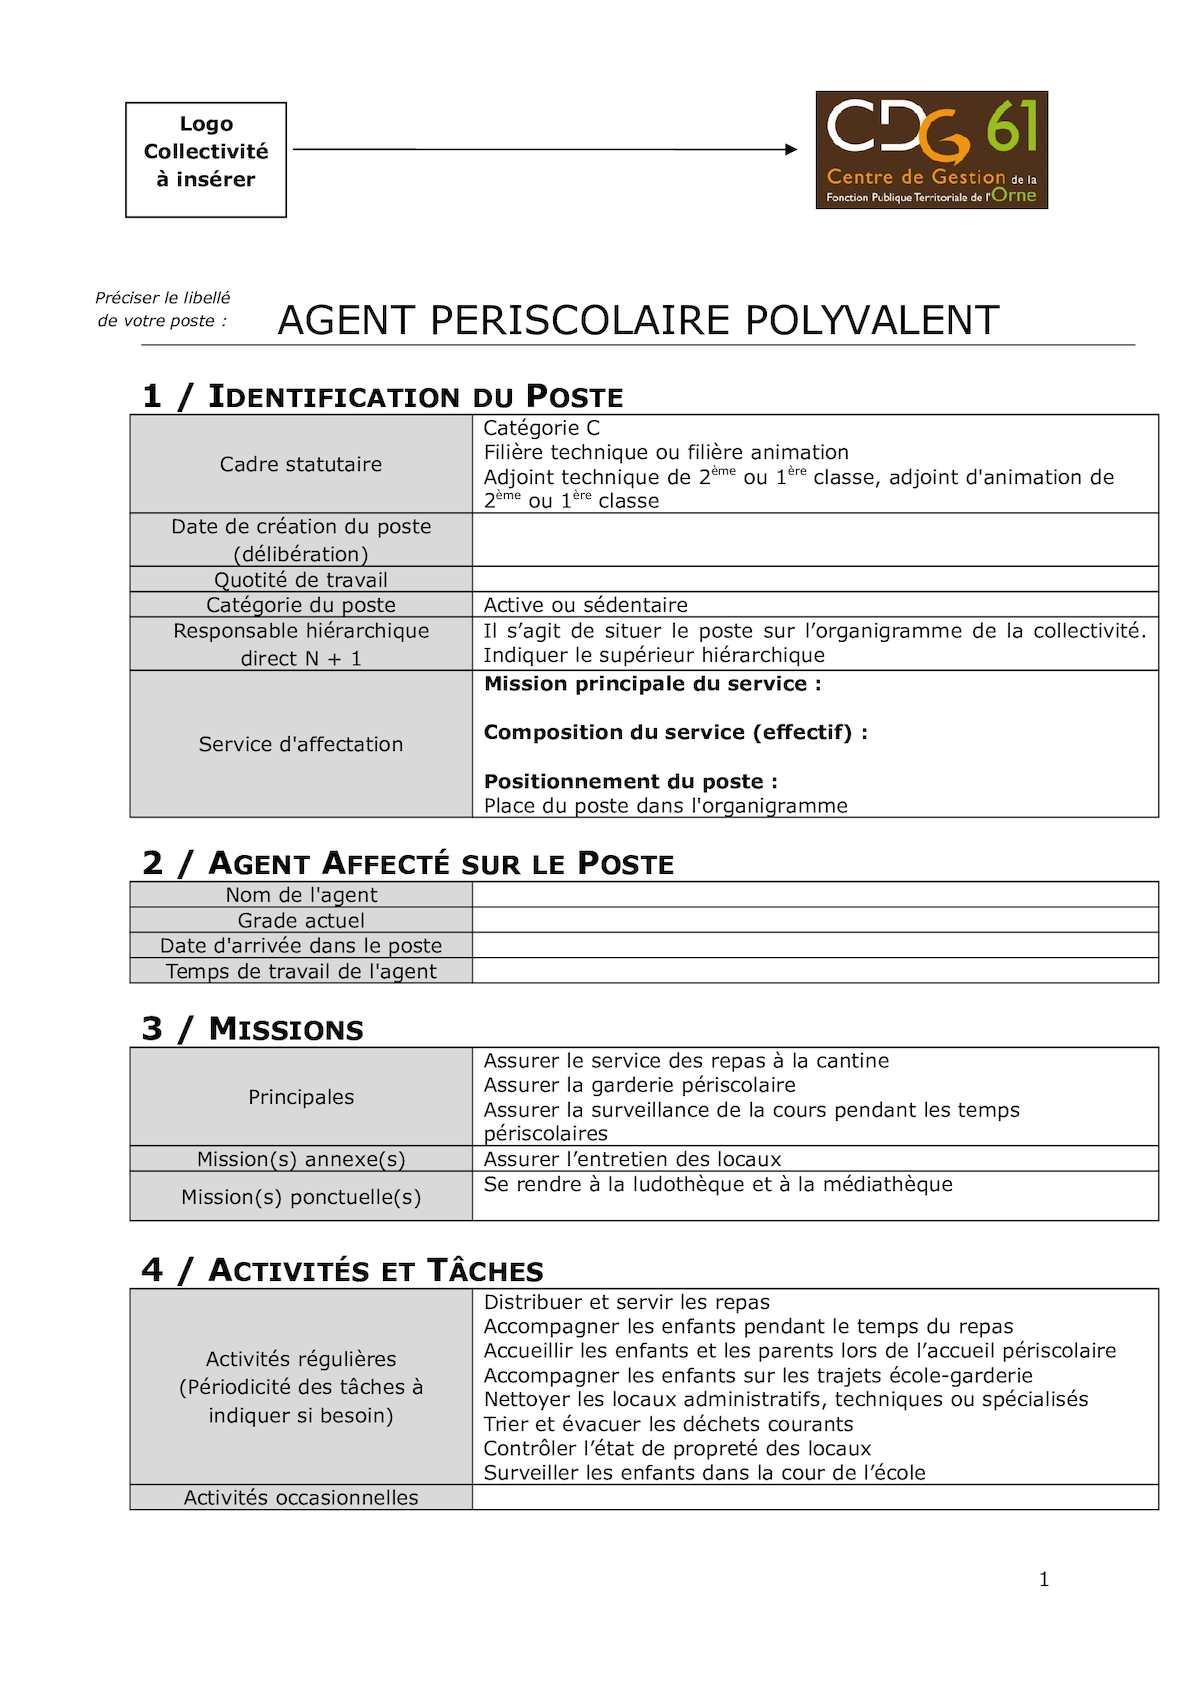 Calameo Cdg61 Agent Periscolaire Polyvalent Fiche De Poste